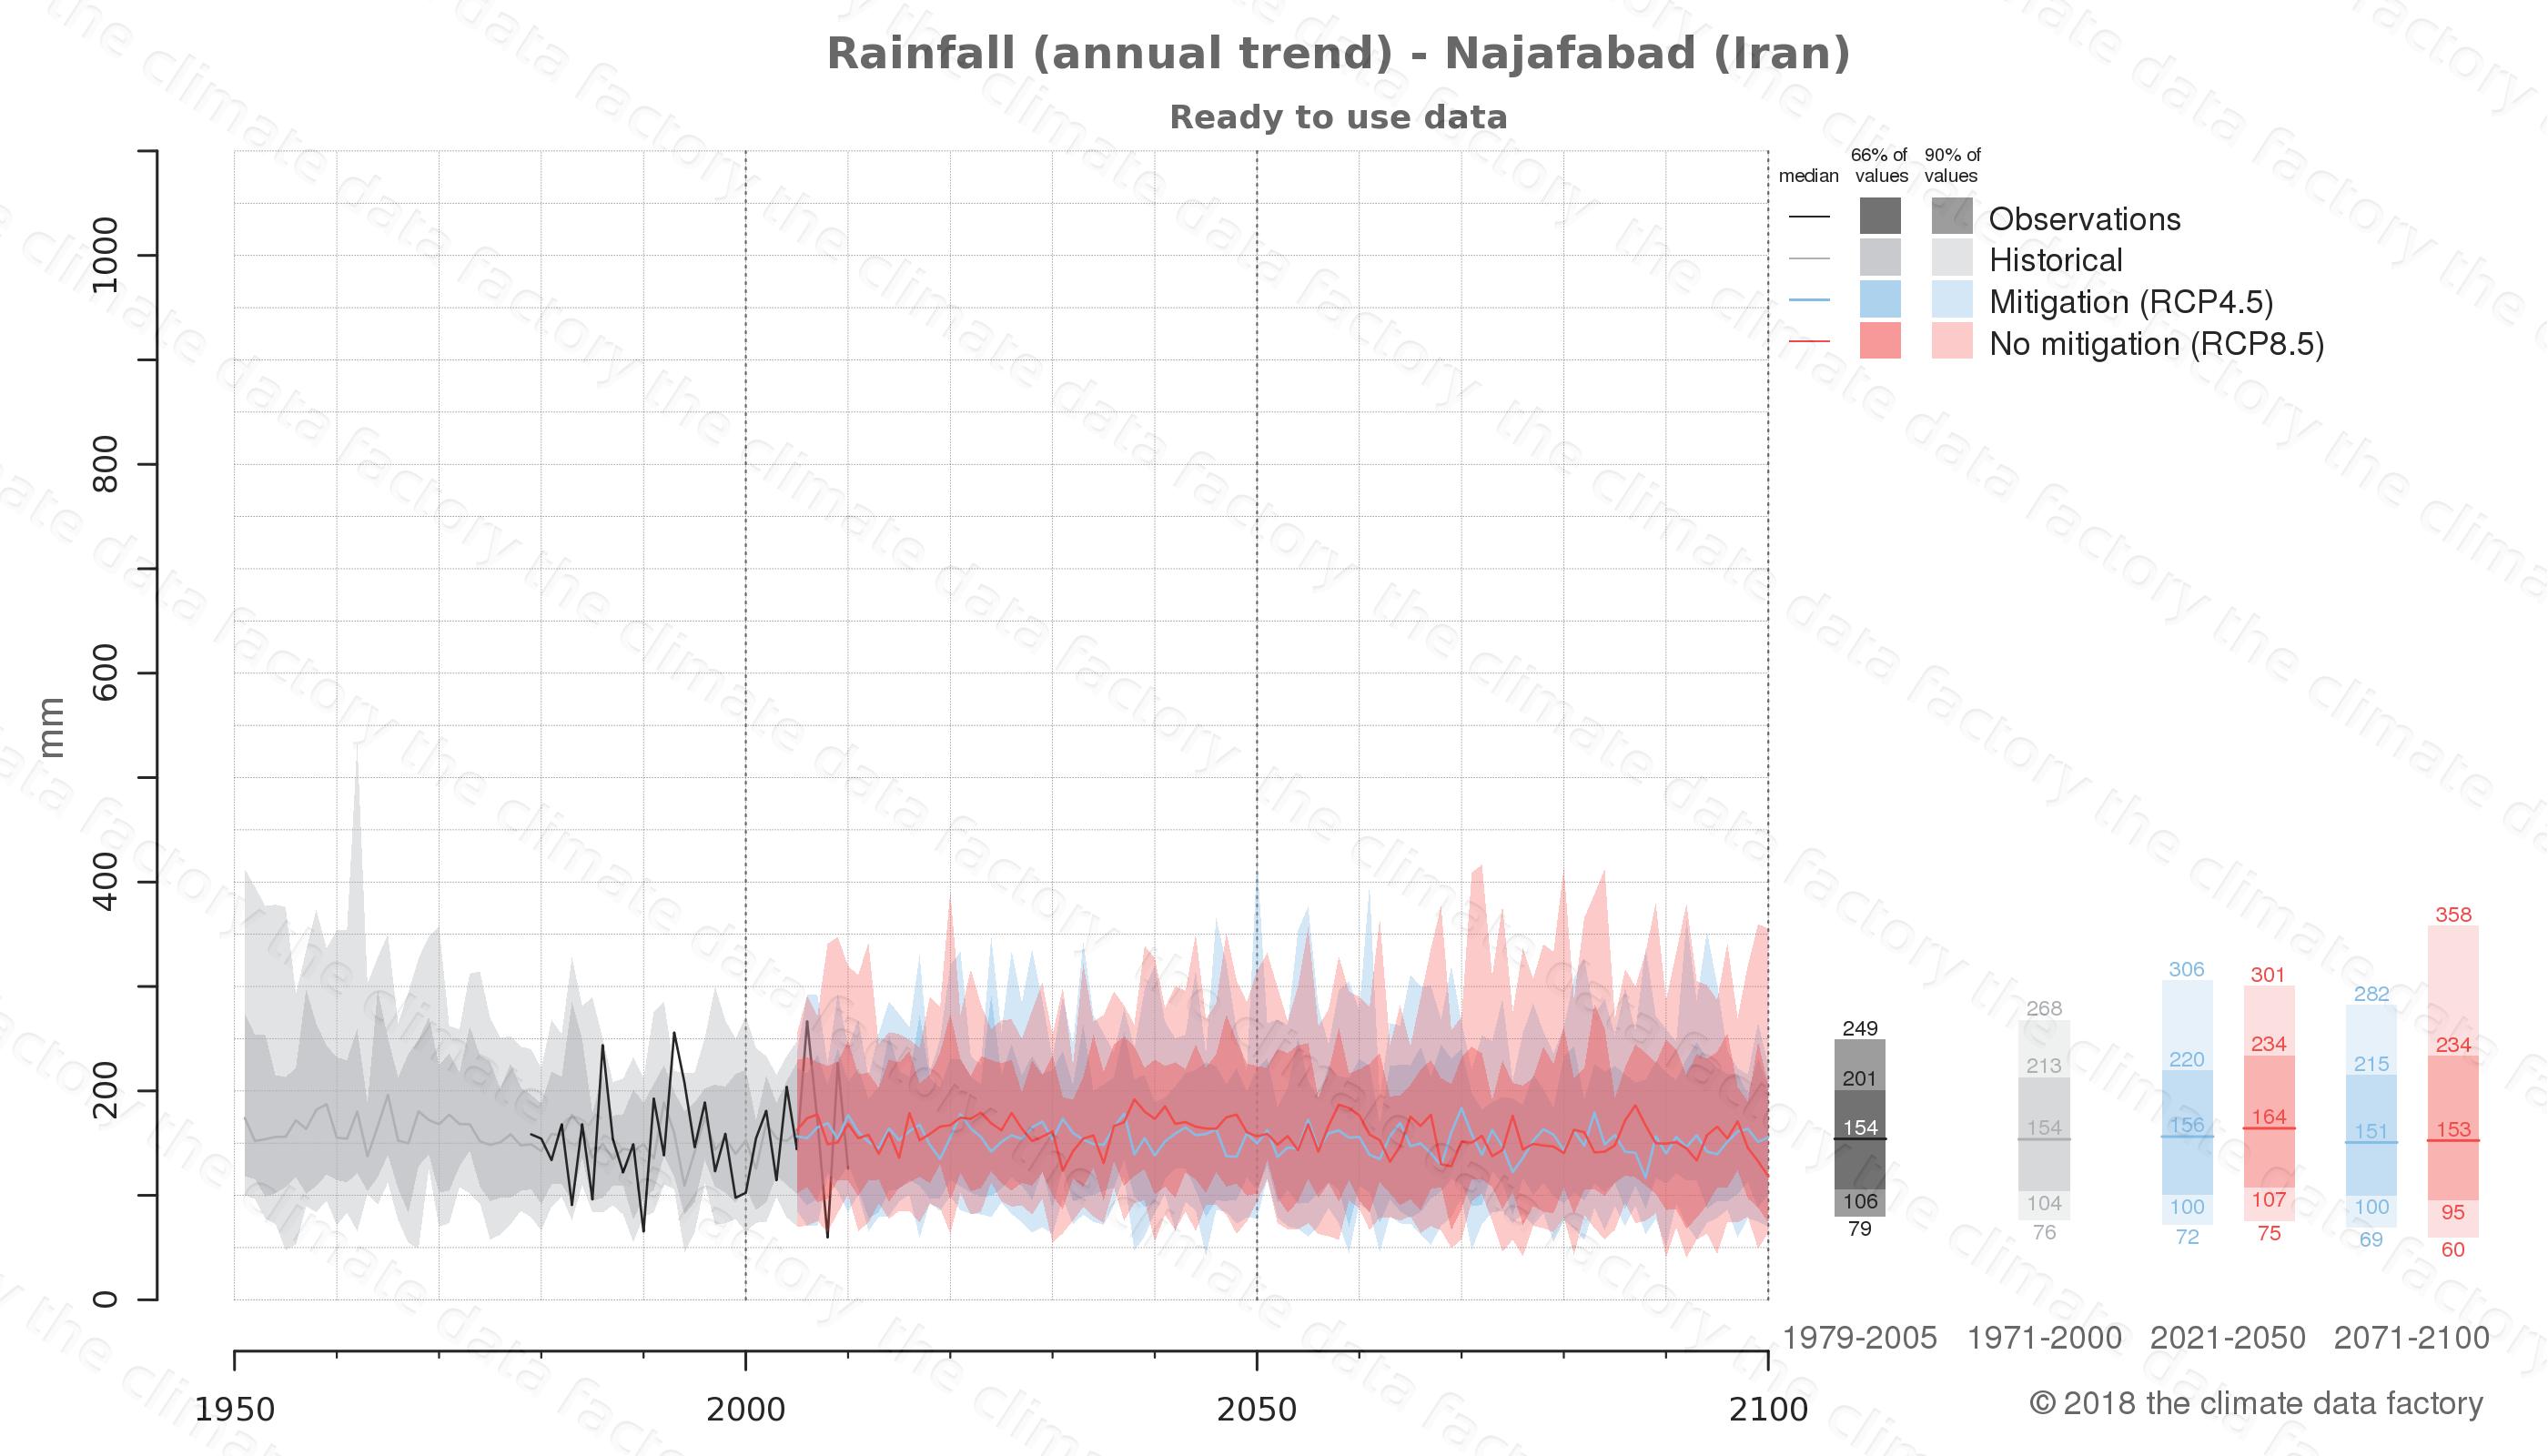 climate change data policy adaptation climate graph city data rainfall najafabad iran